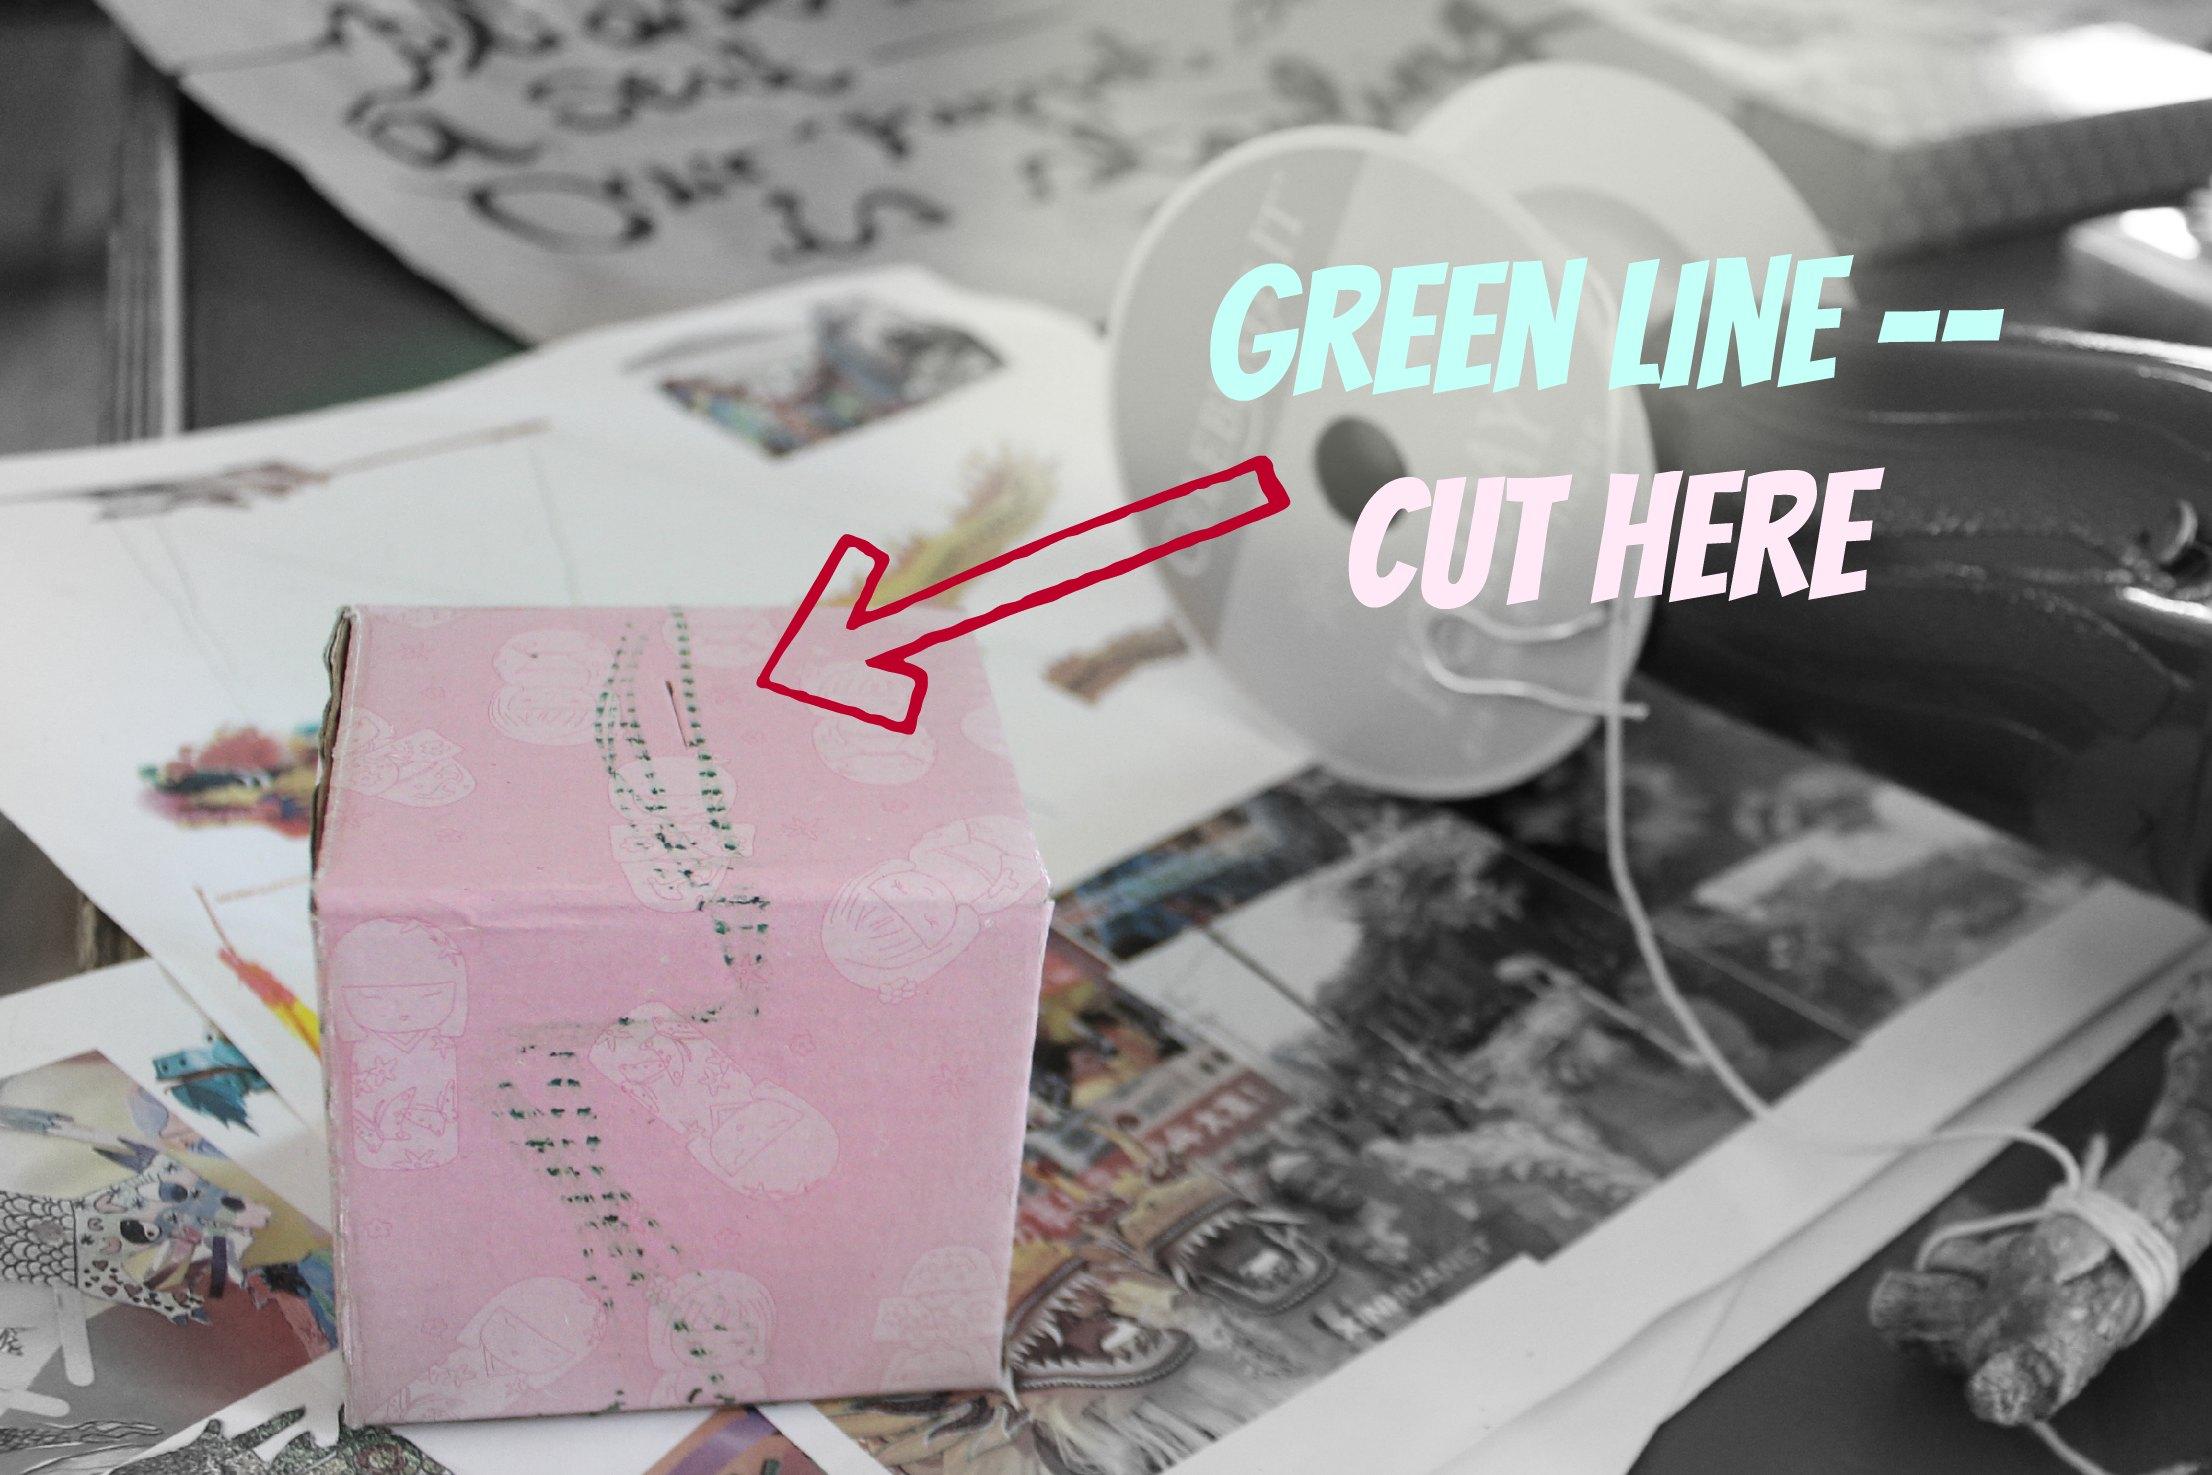 Green line cut here